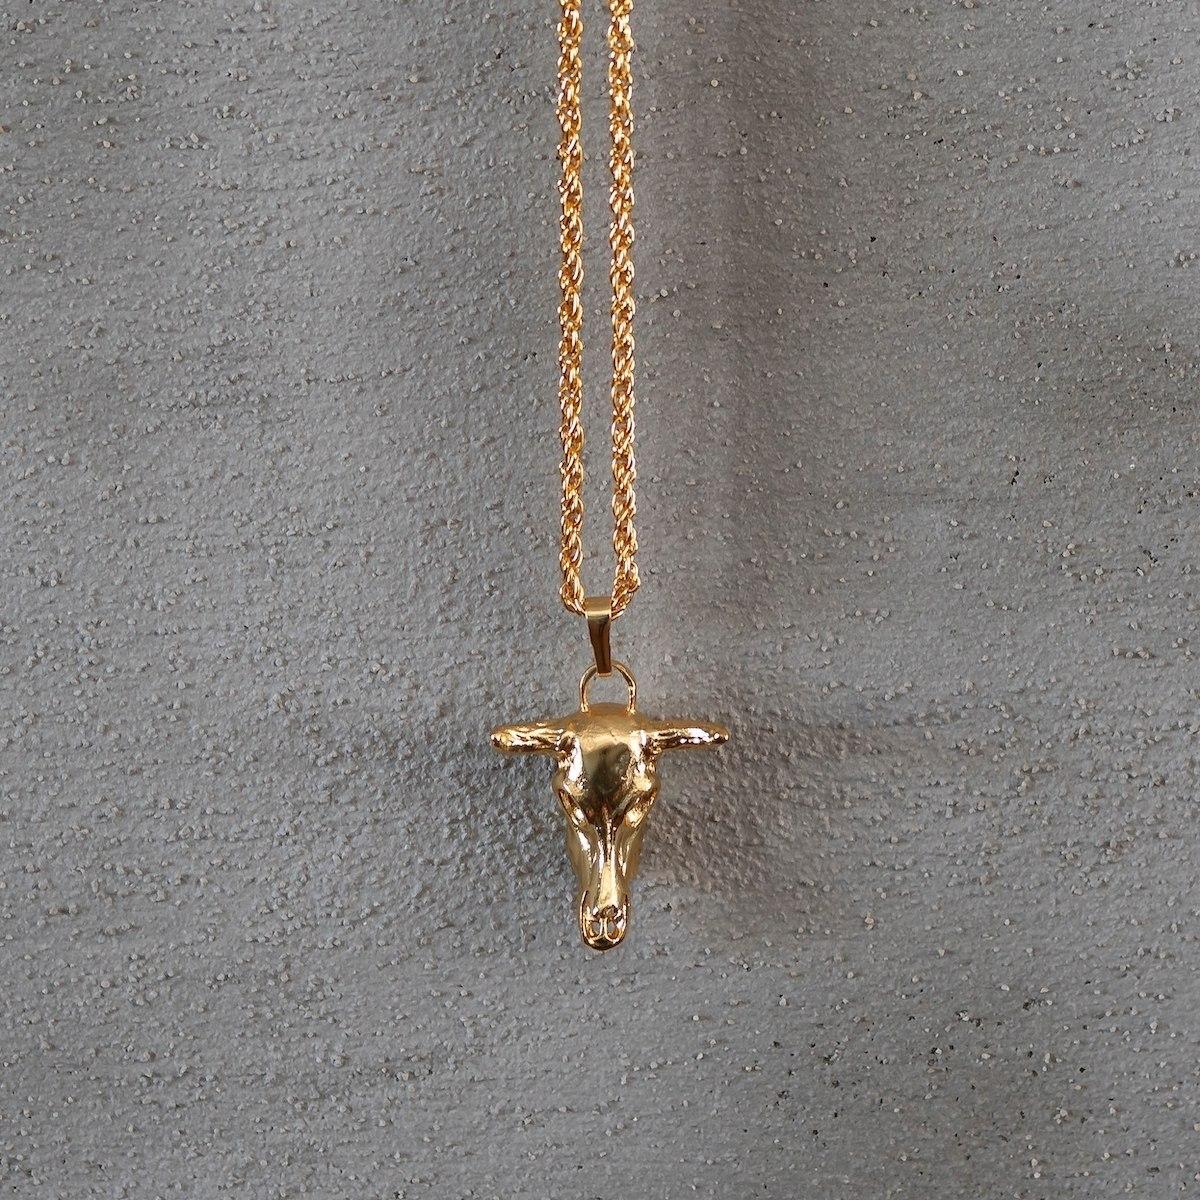 Men's Gold Bull Necklace